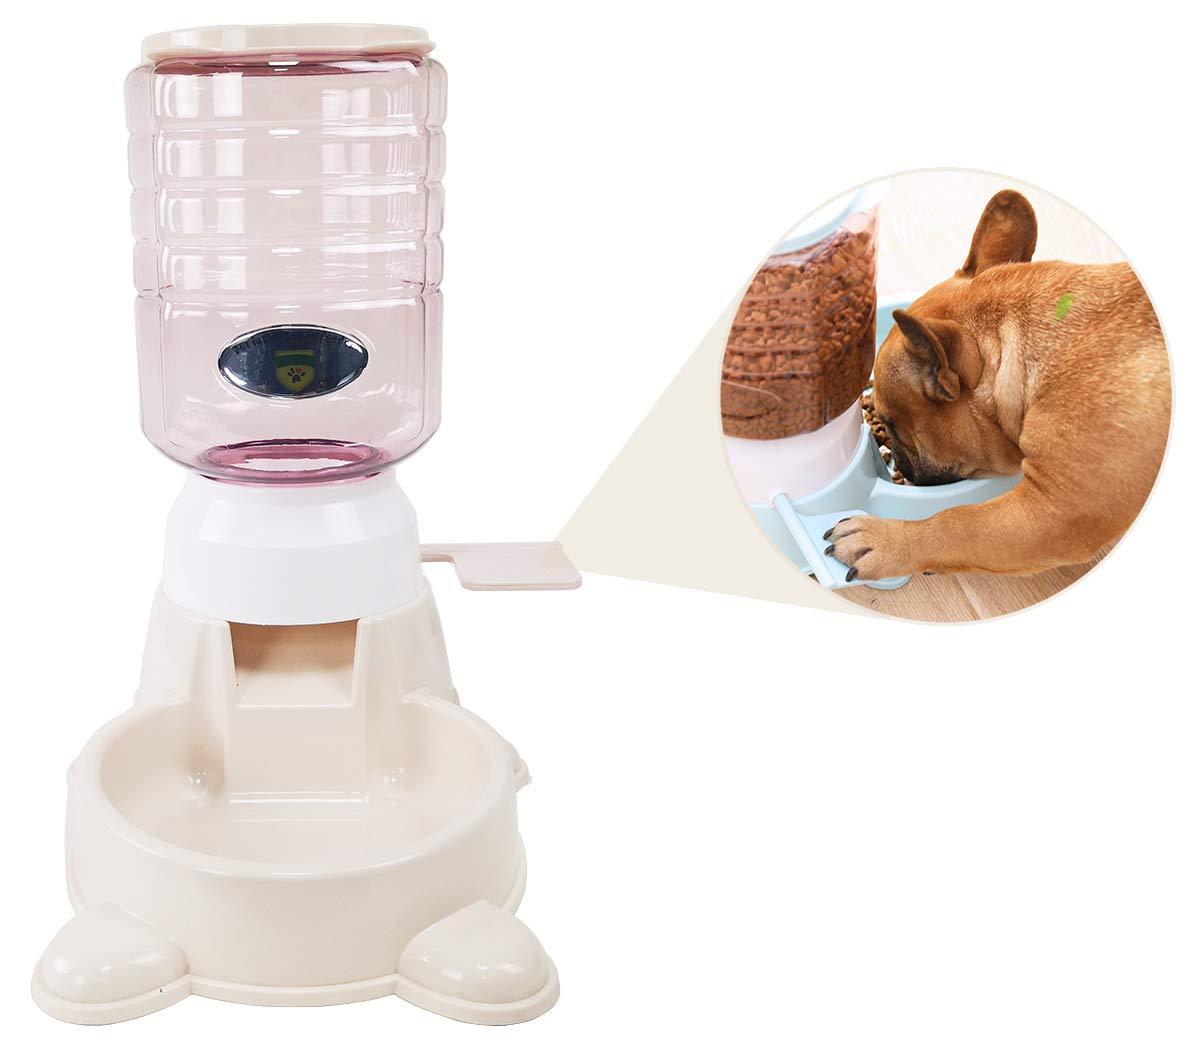 Jmini Pet Feeder 3.8L Press Pedal Self Feeding Dry Food Dispenser for Cat Dog